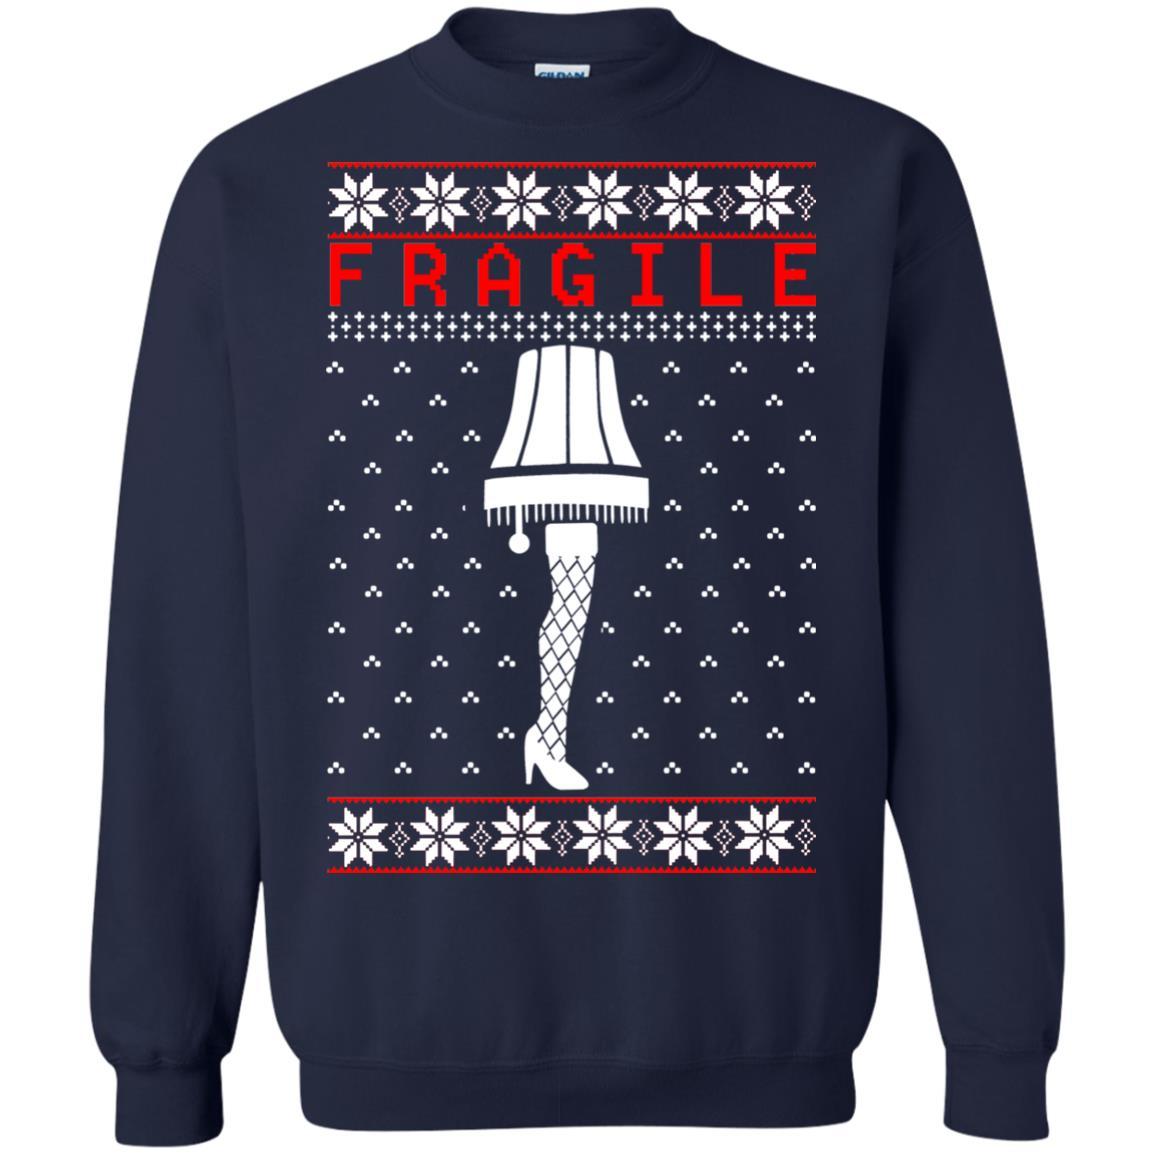 image 6758 - Christmas Story Fragile The Leg Lamp Ugly Sweater, Long Sleeve